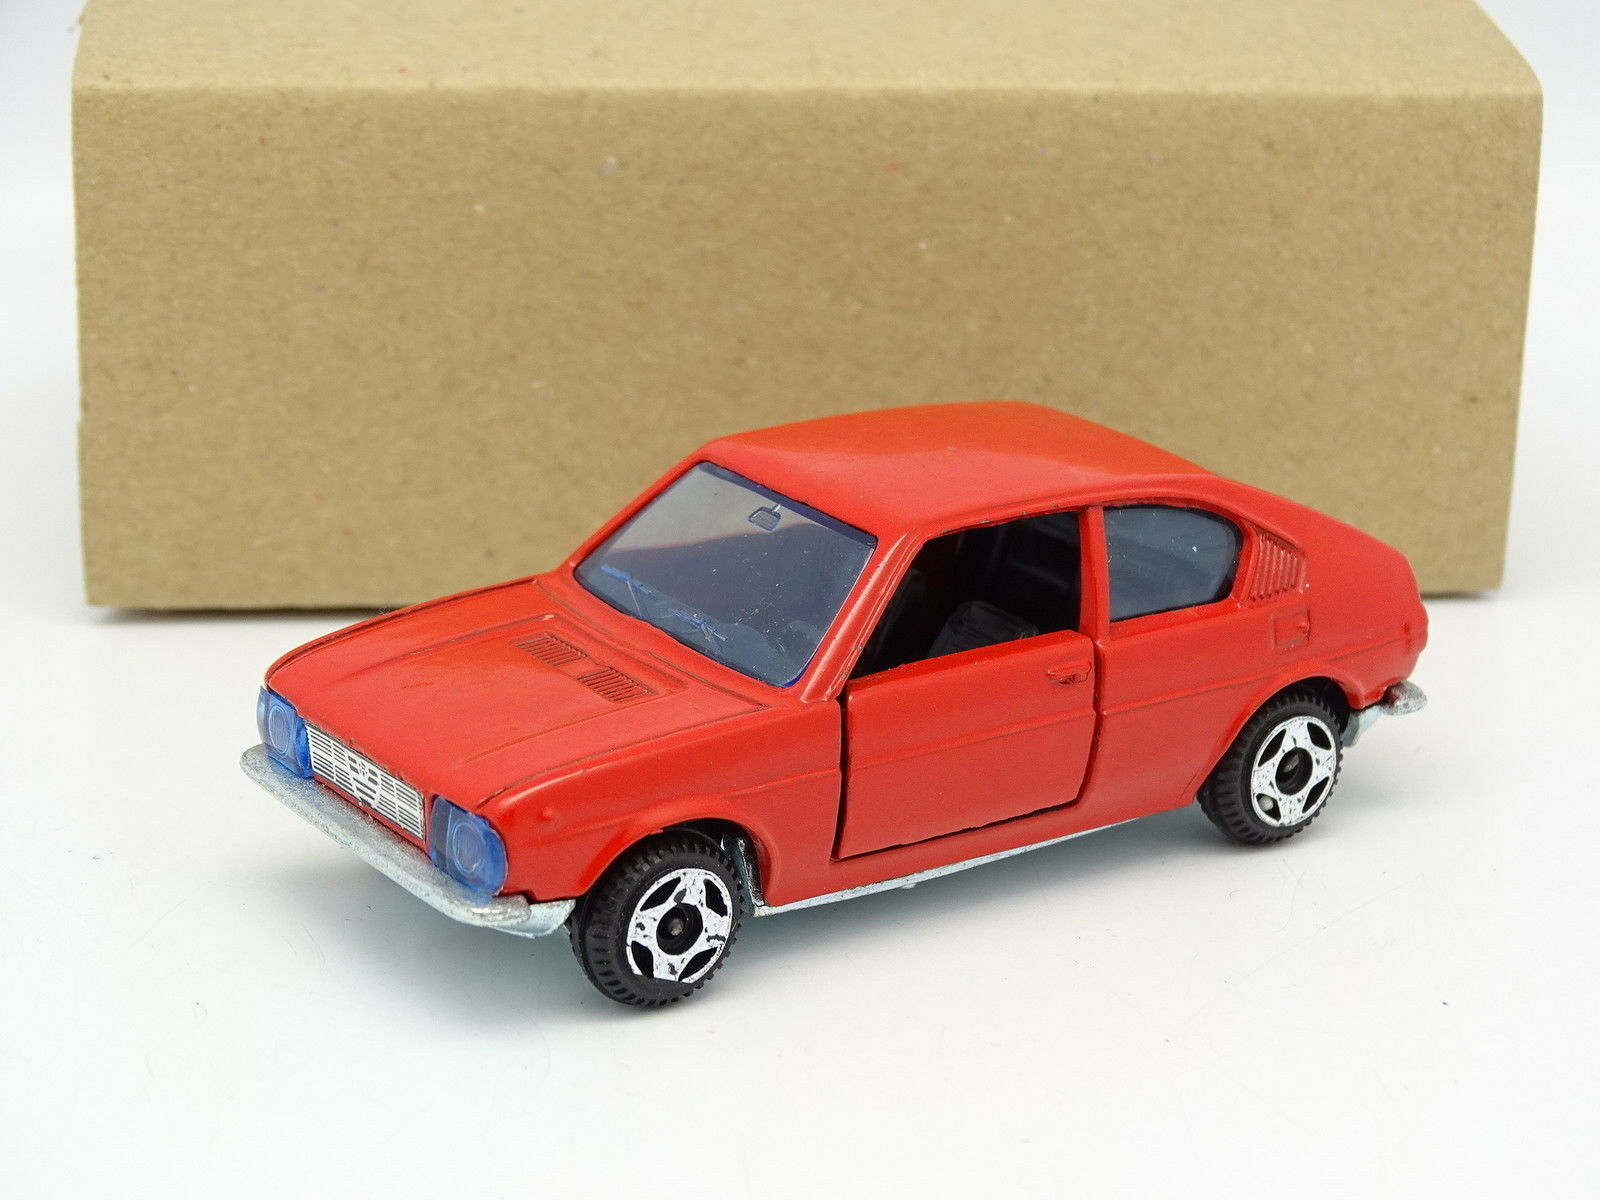 Polistil 1 43 - Alfa Romeo Alfasud red red red 1f1bd6